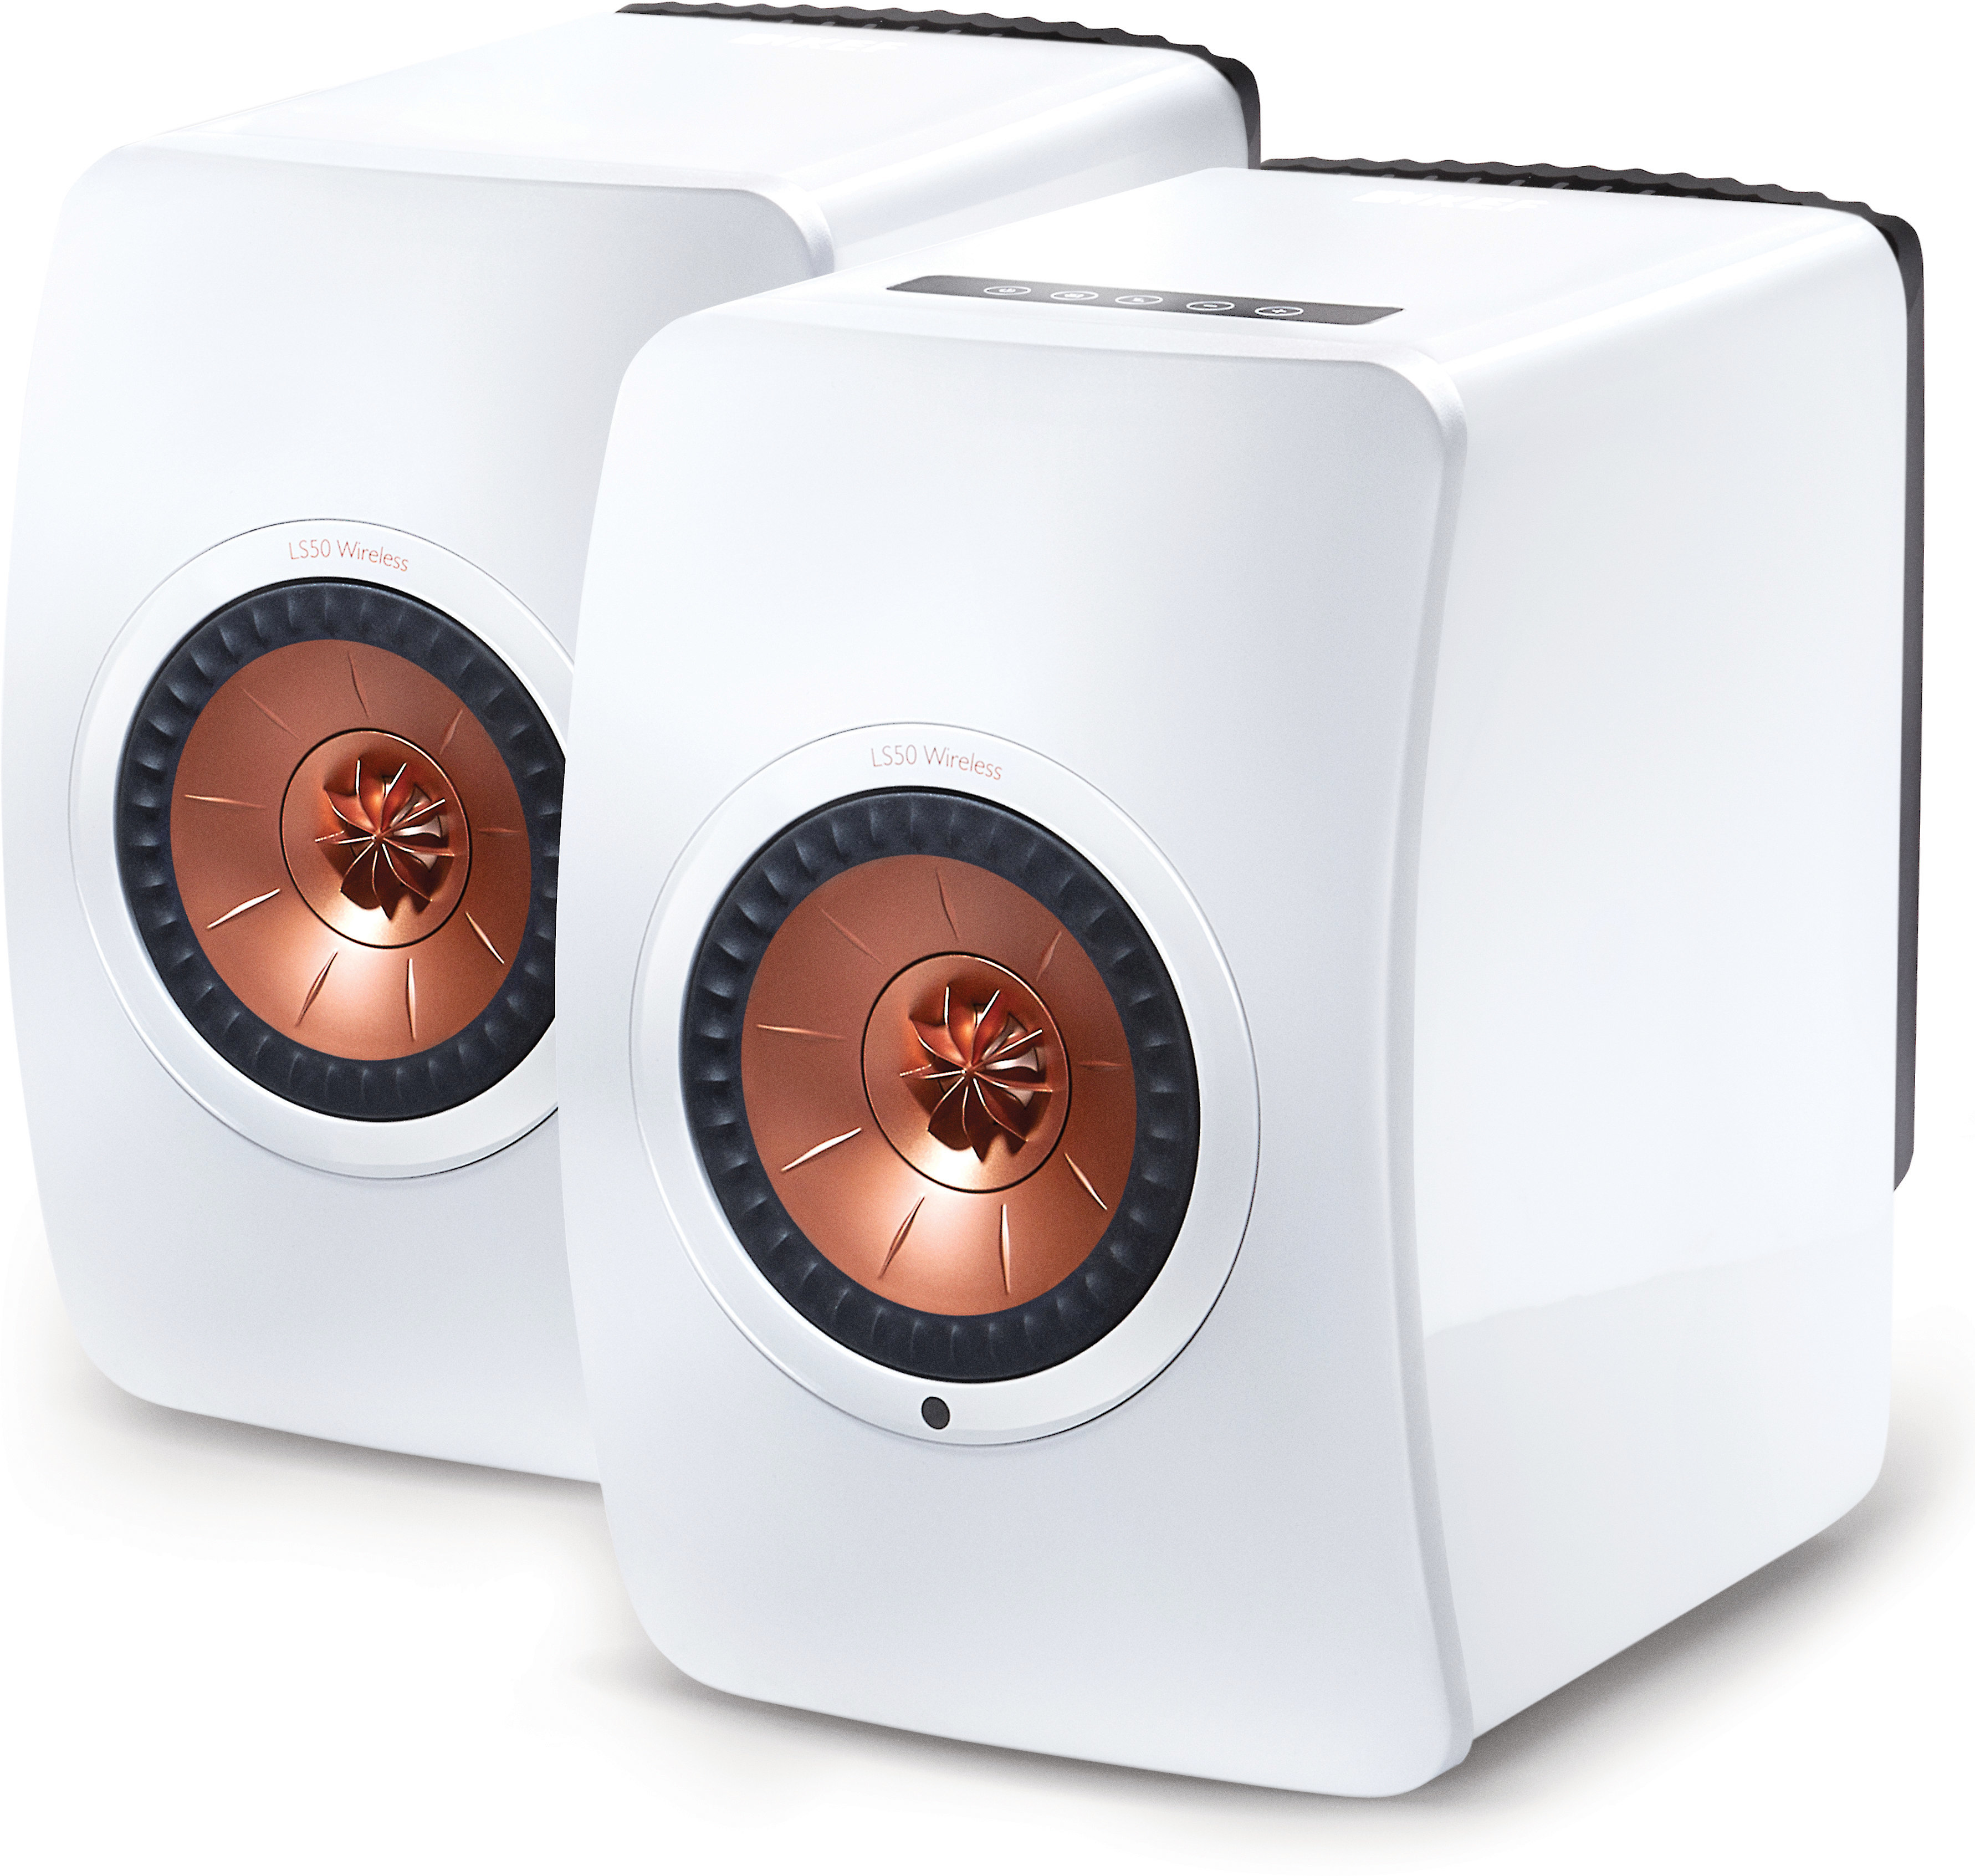 KEF LS50 Wireless (Gloss White/Copper)